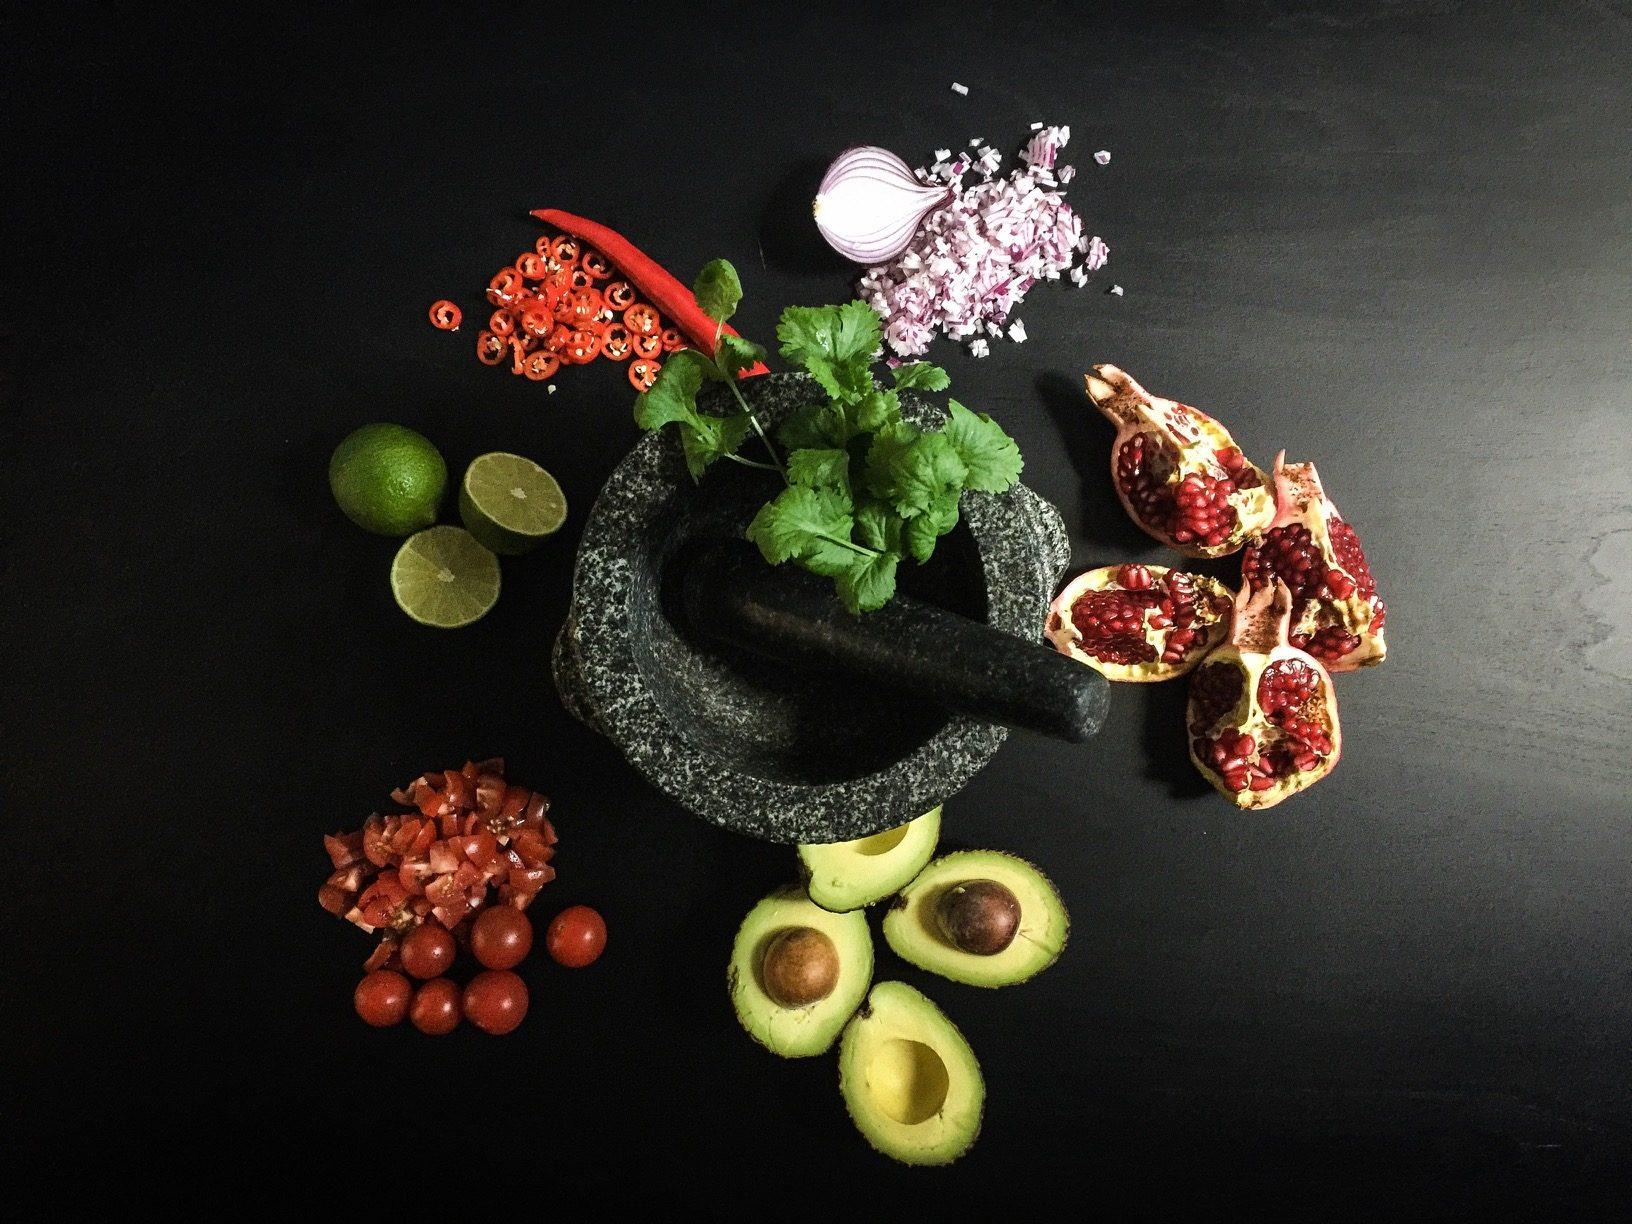 Raikkaan guacamolen ainekset